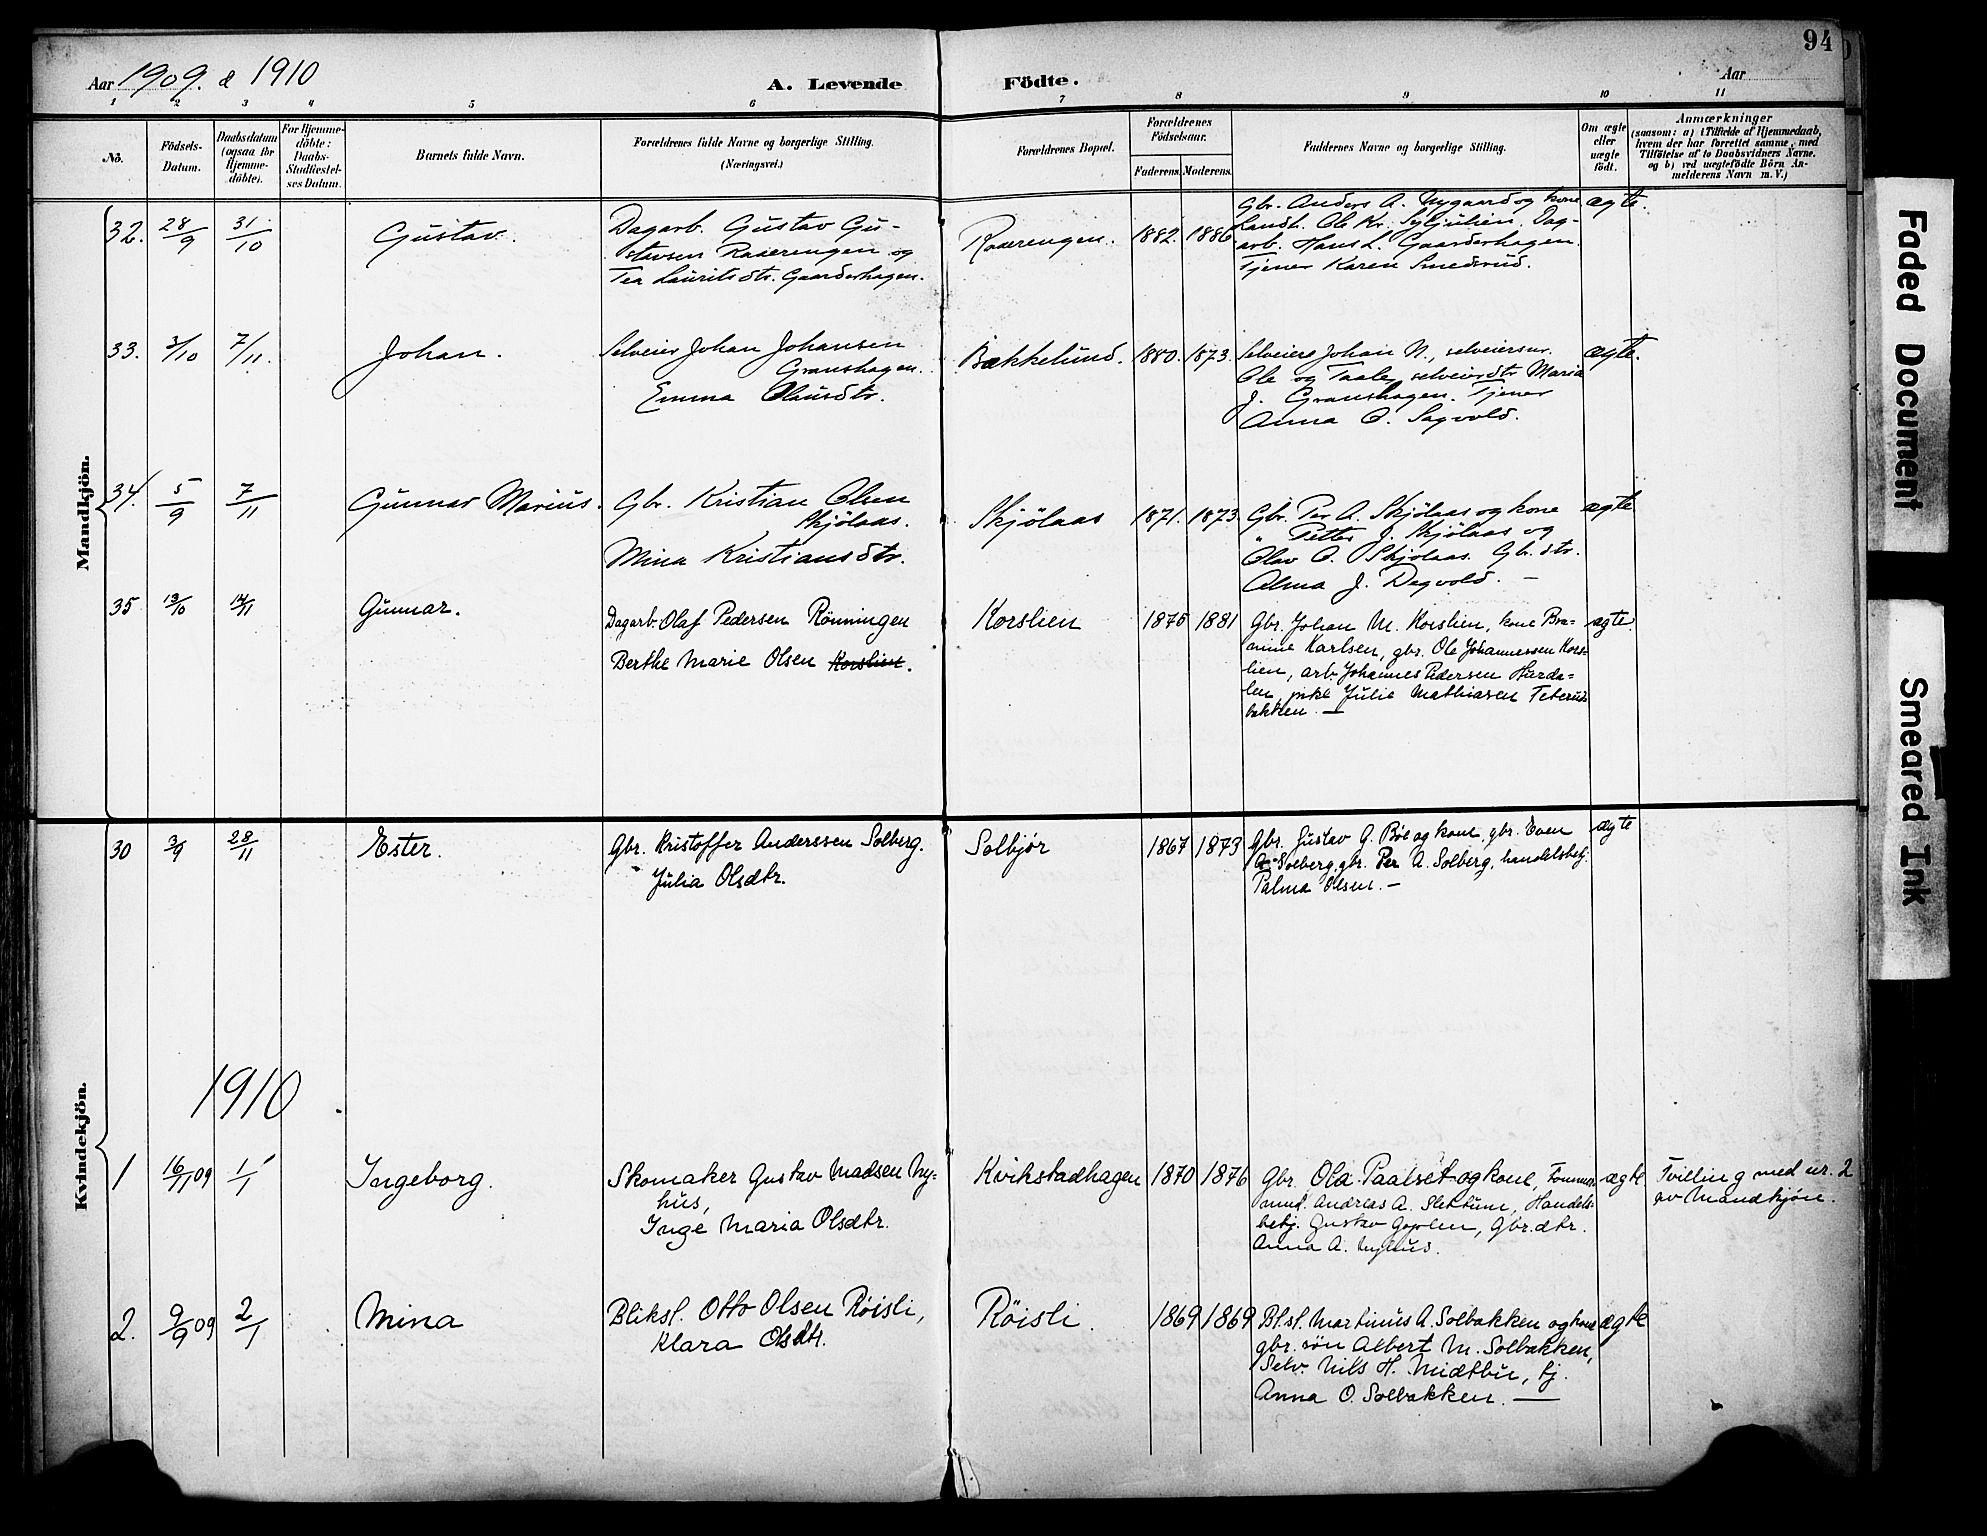 SAH, Vestre Toten prestekontor, H/Ha/Haa/L0013: Ministerialbok nr. 13, 1895-1911, s. 94